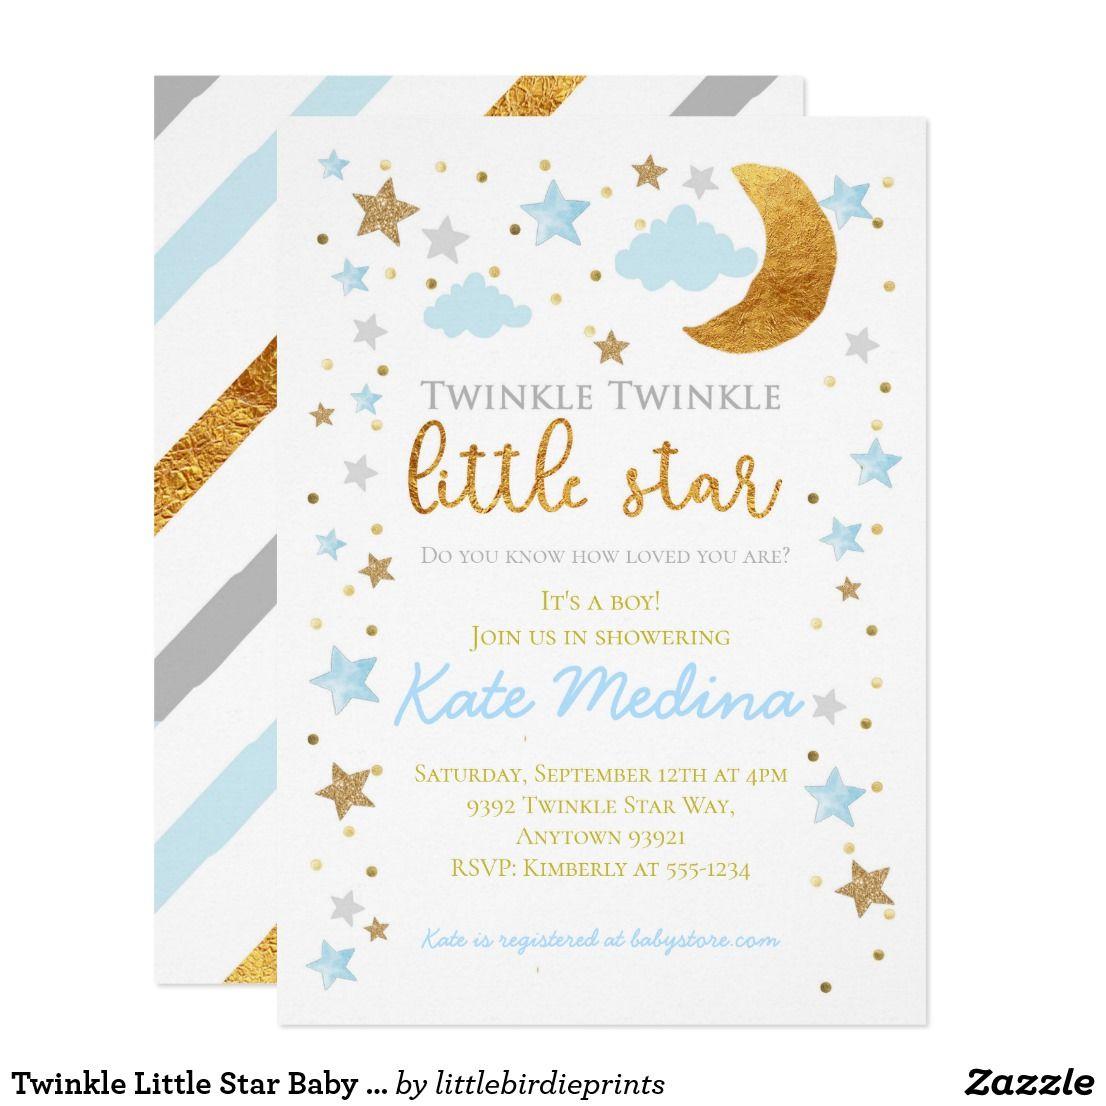 Twinkle Little Star Baby Shower Invitation Boy Blu Zazzle Com Star Baby Shower Invitations Blue Baby Shower Invitations Baby Shower Invitations For Boys